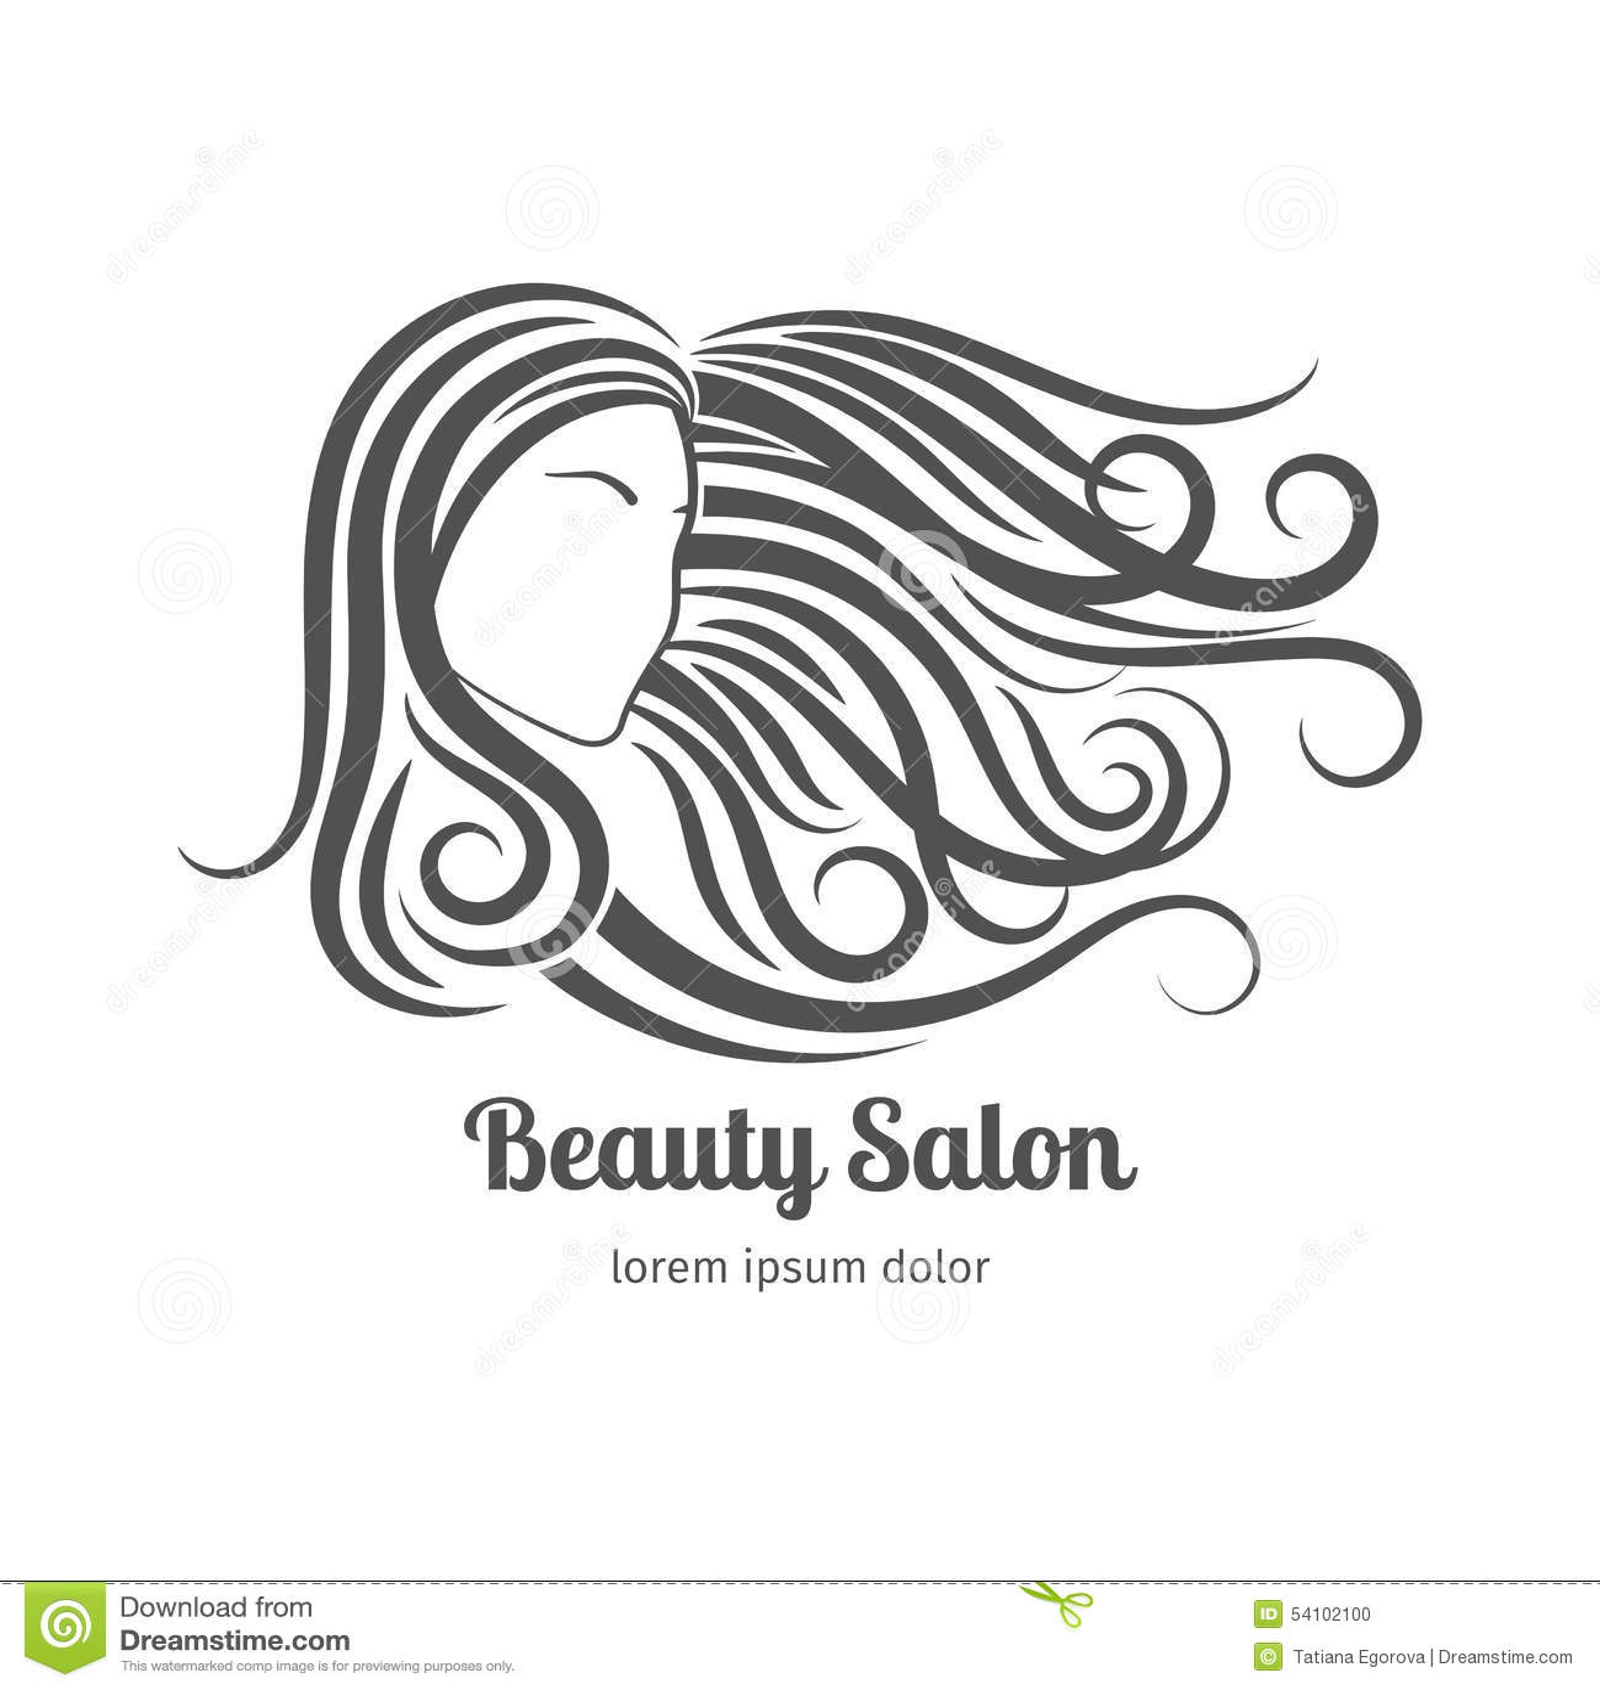 Salon Logo Stock Images RoyaltyFree Images amp Vectors